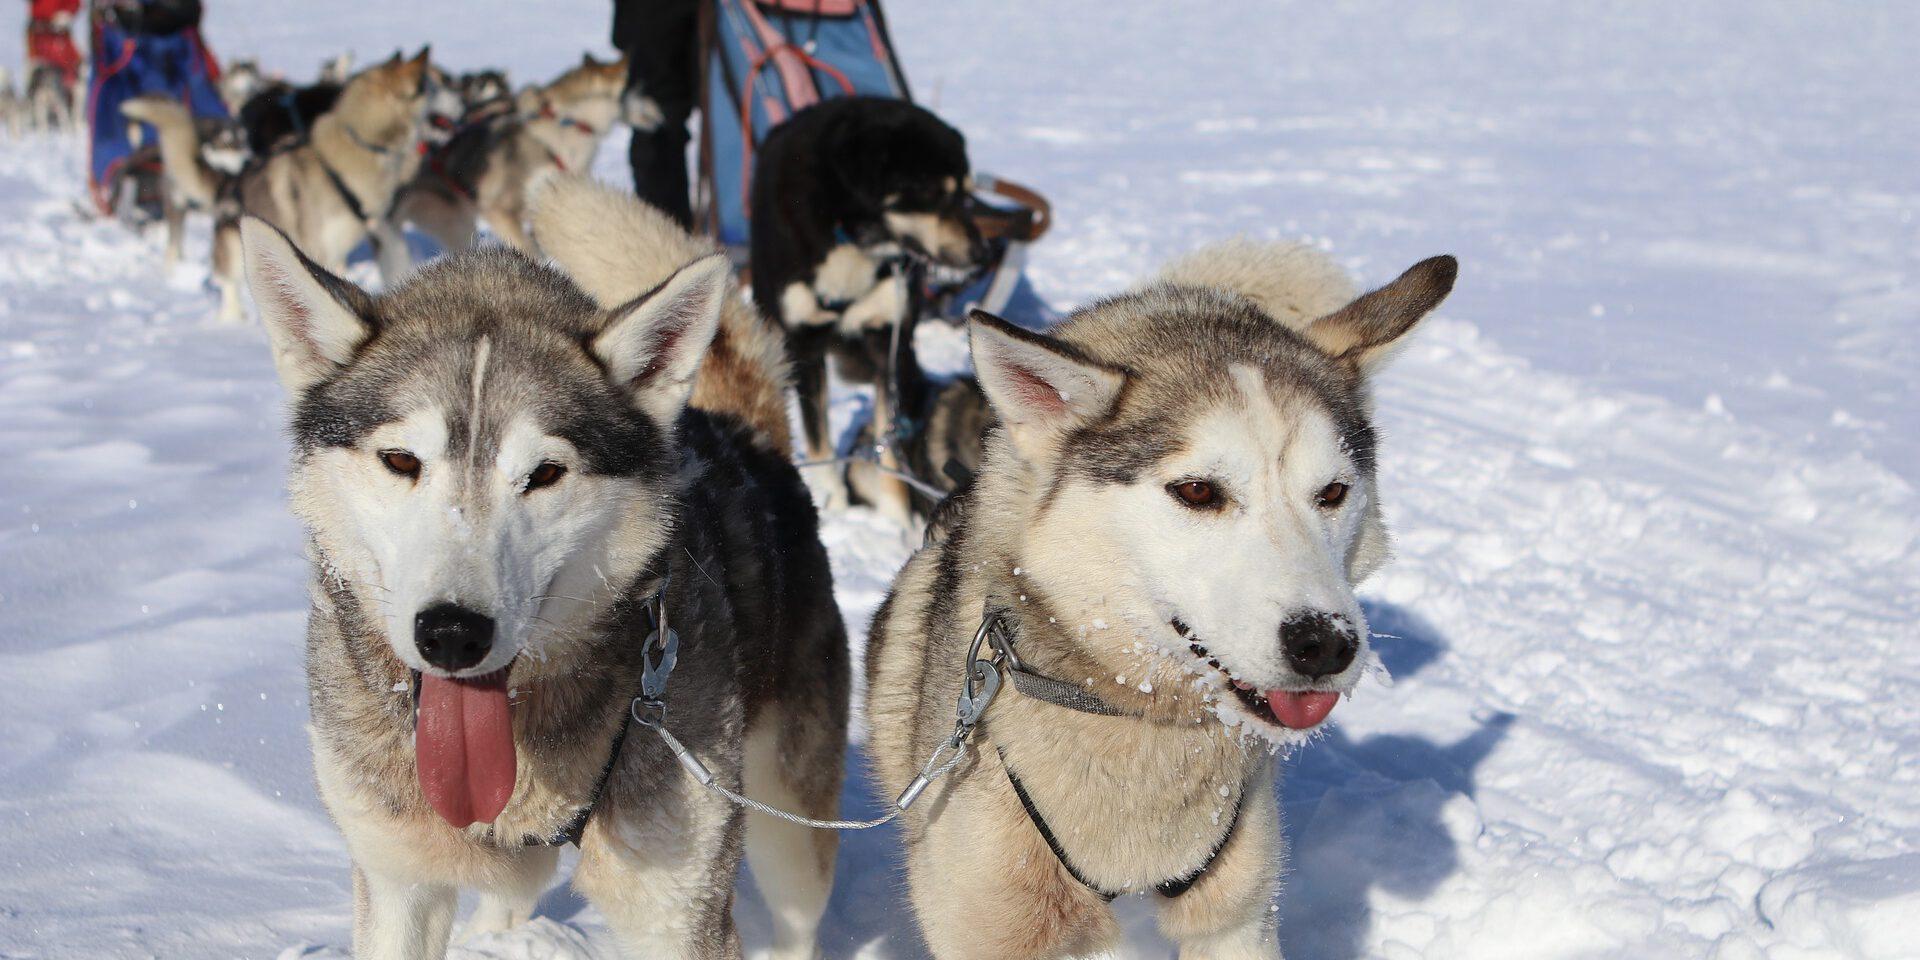 Alternatieve wintersporten in de Alpen